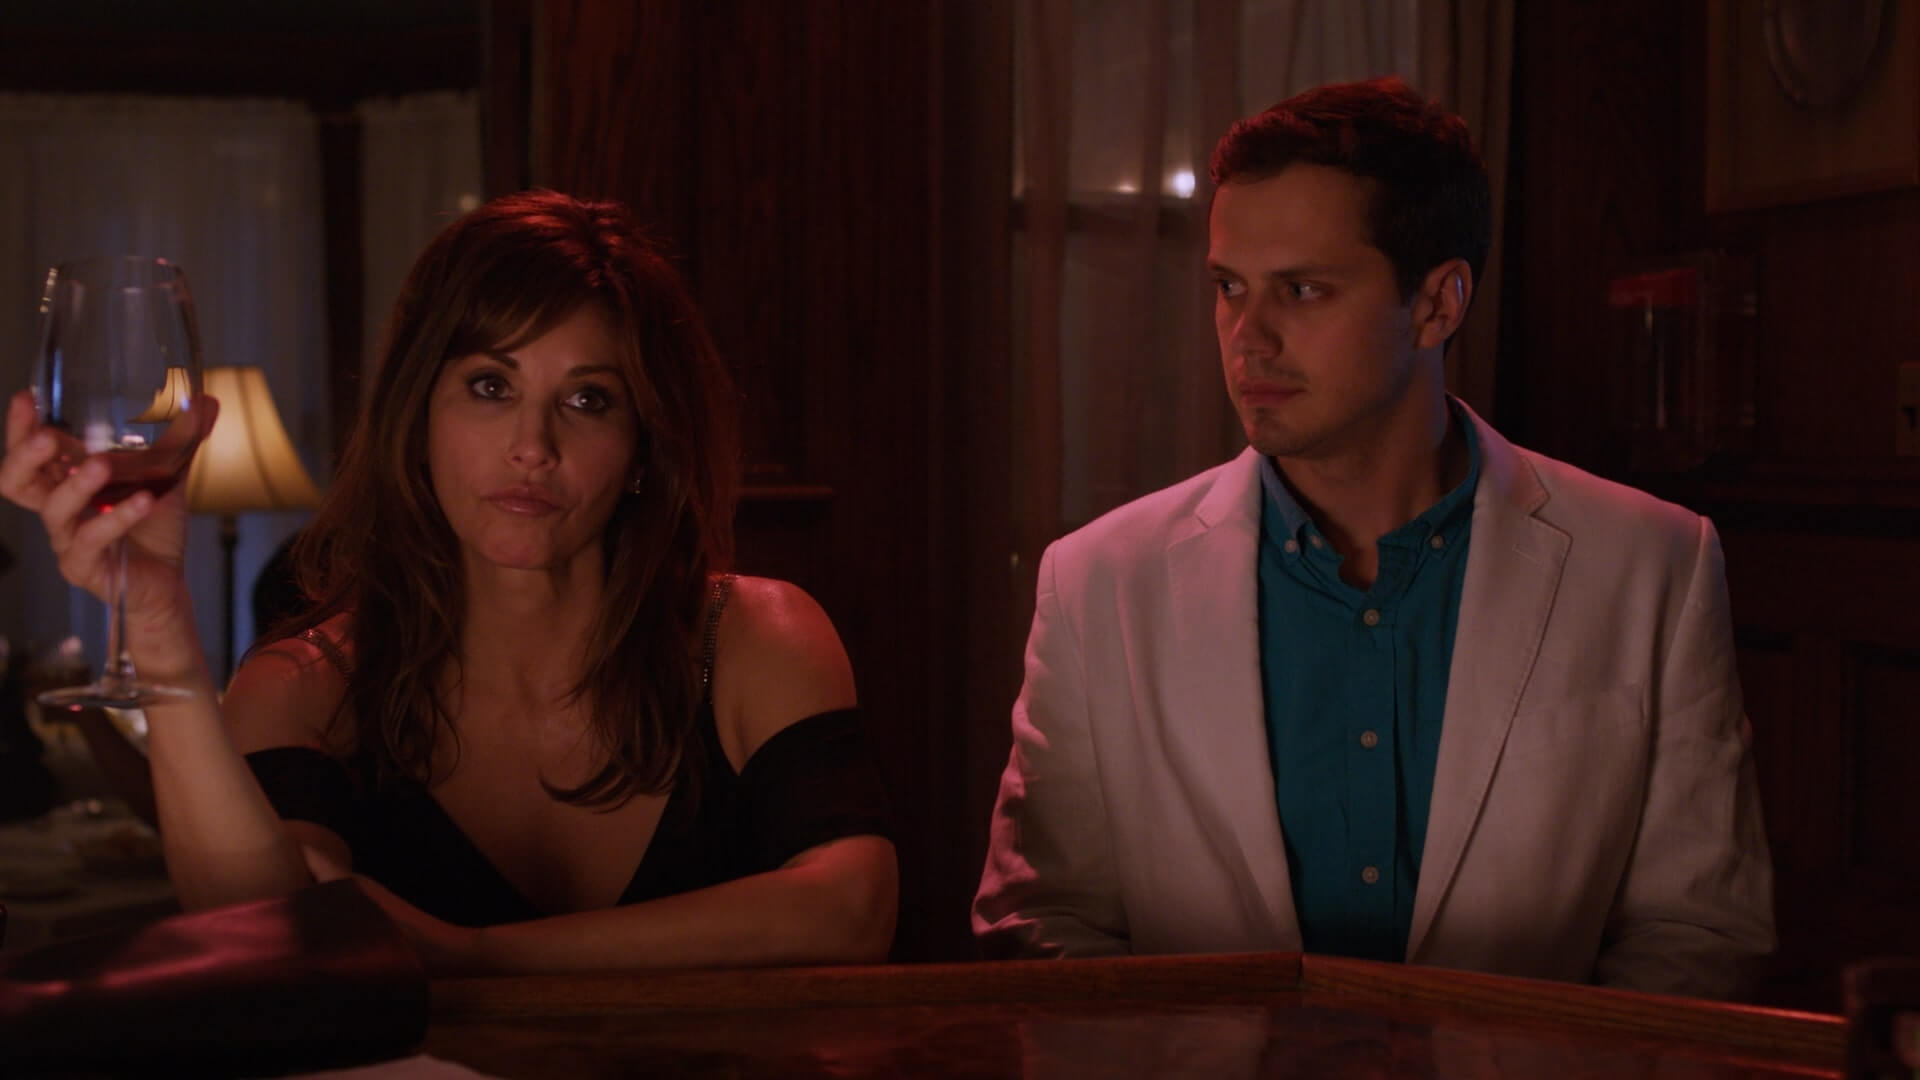 Gina Gershon and Jake Robinson in 'The Mimic'